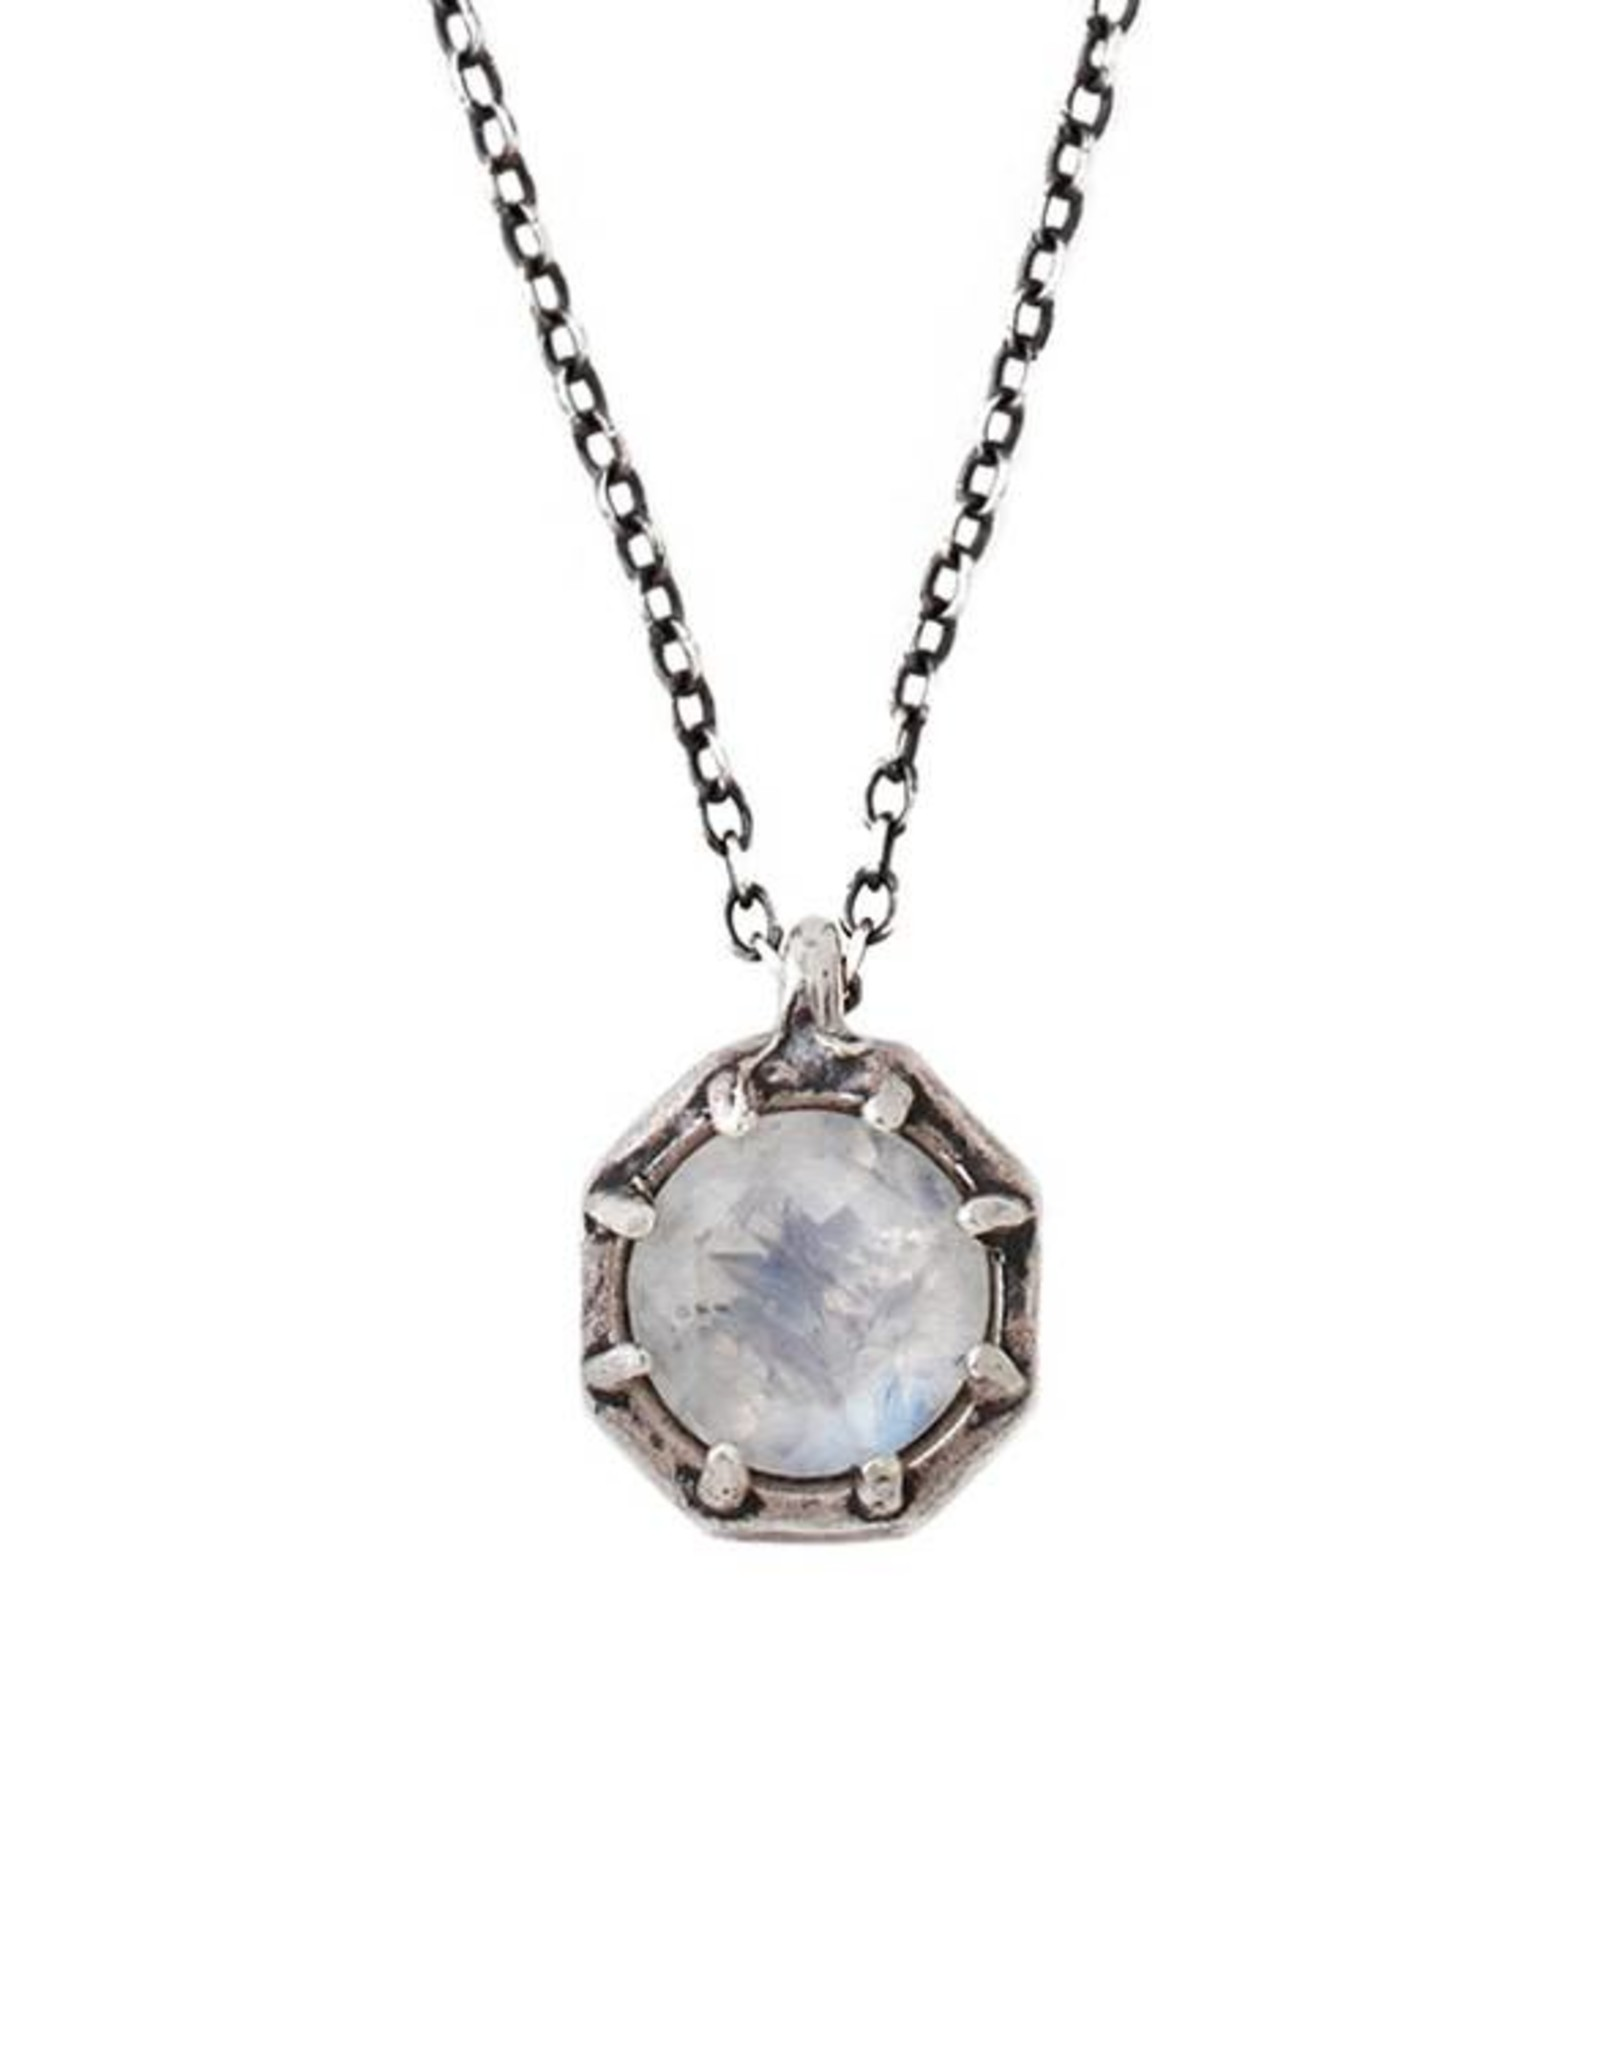 Lauren Wolf Jewelry Oxidized Silver Octagon Necklace - Rainbow Moonstone